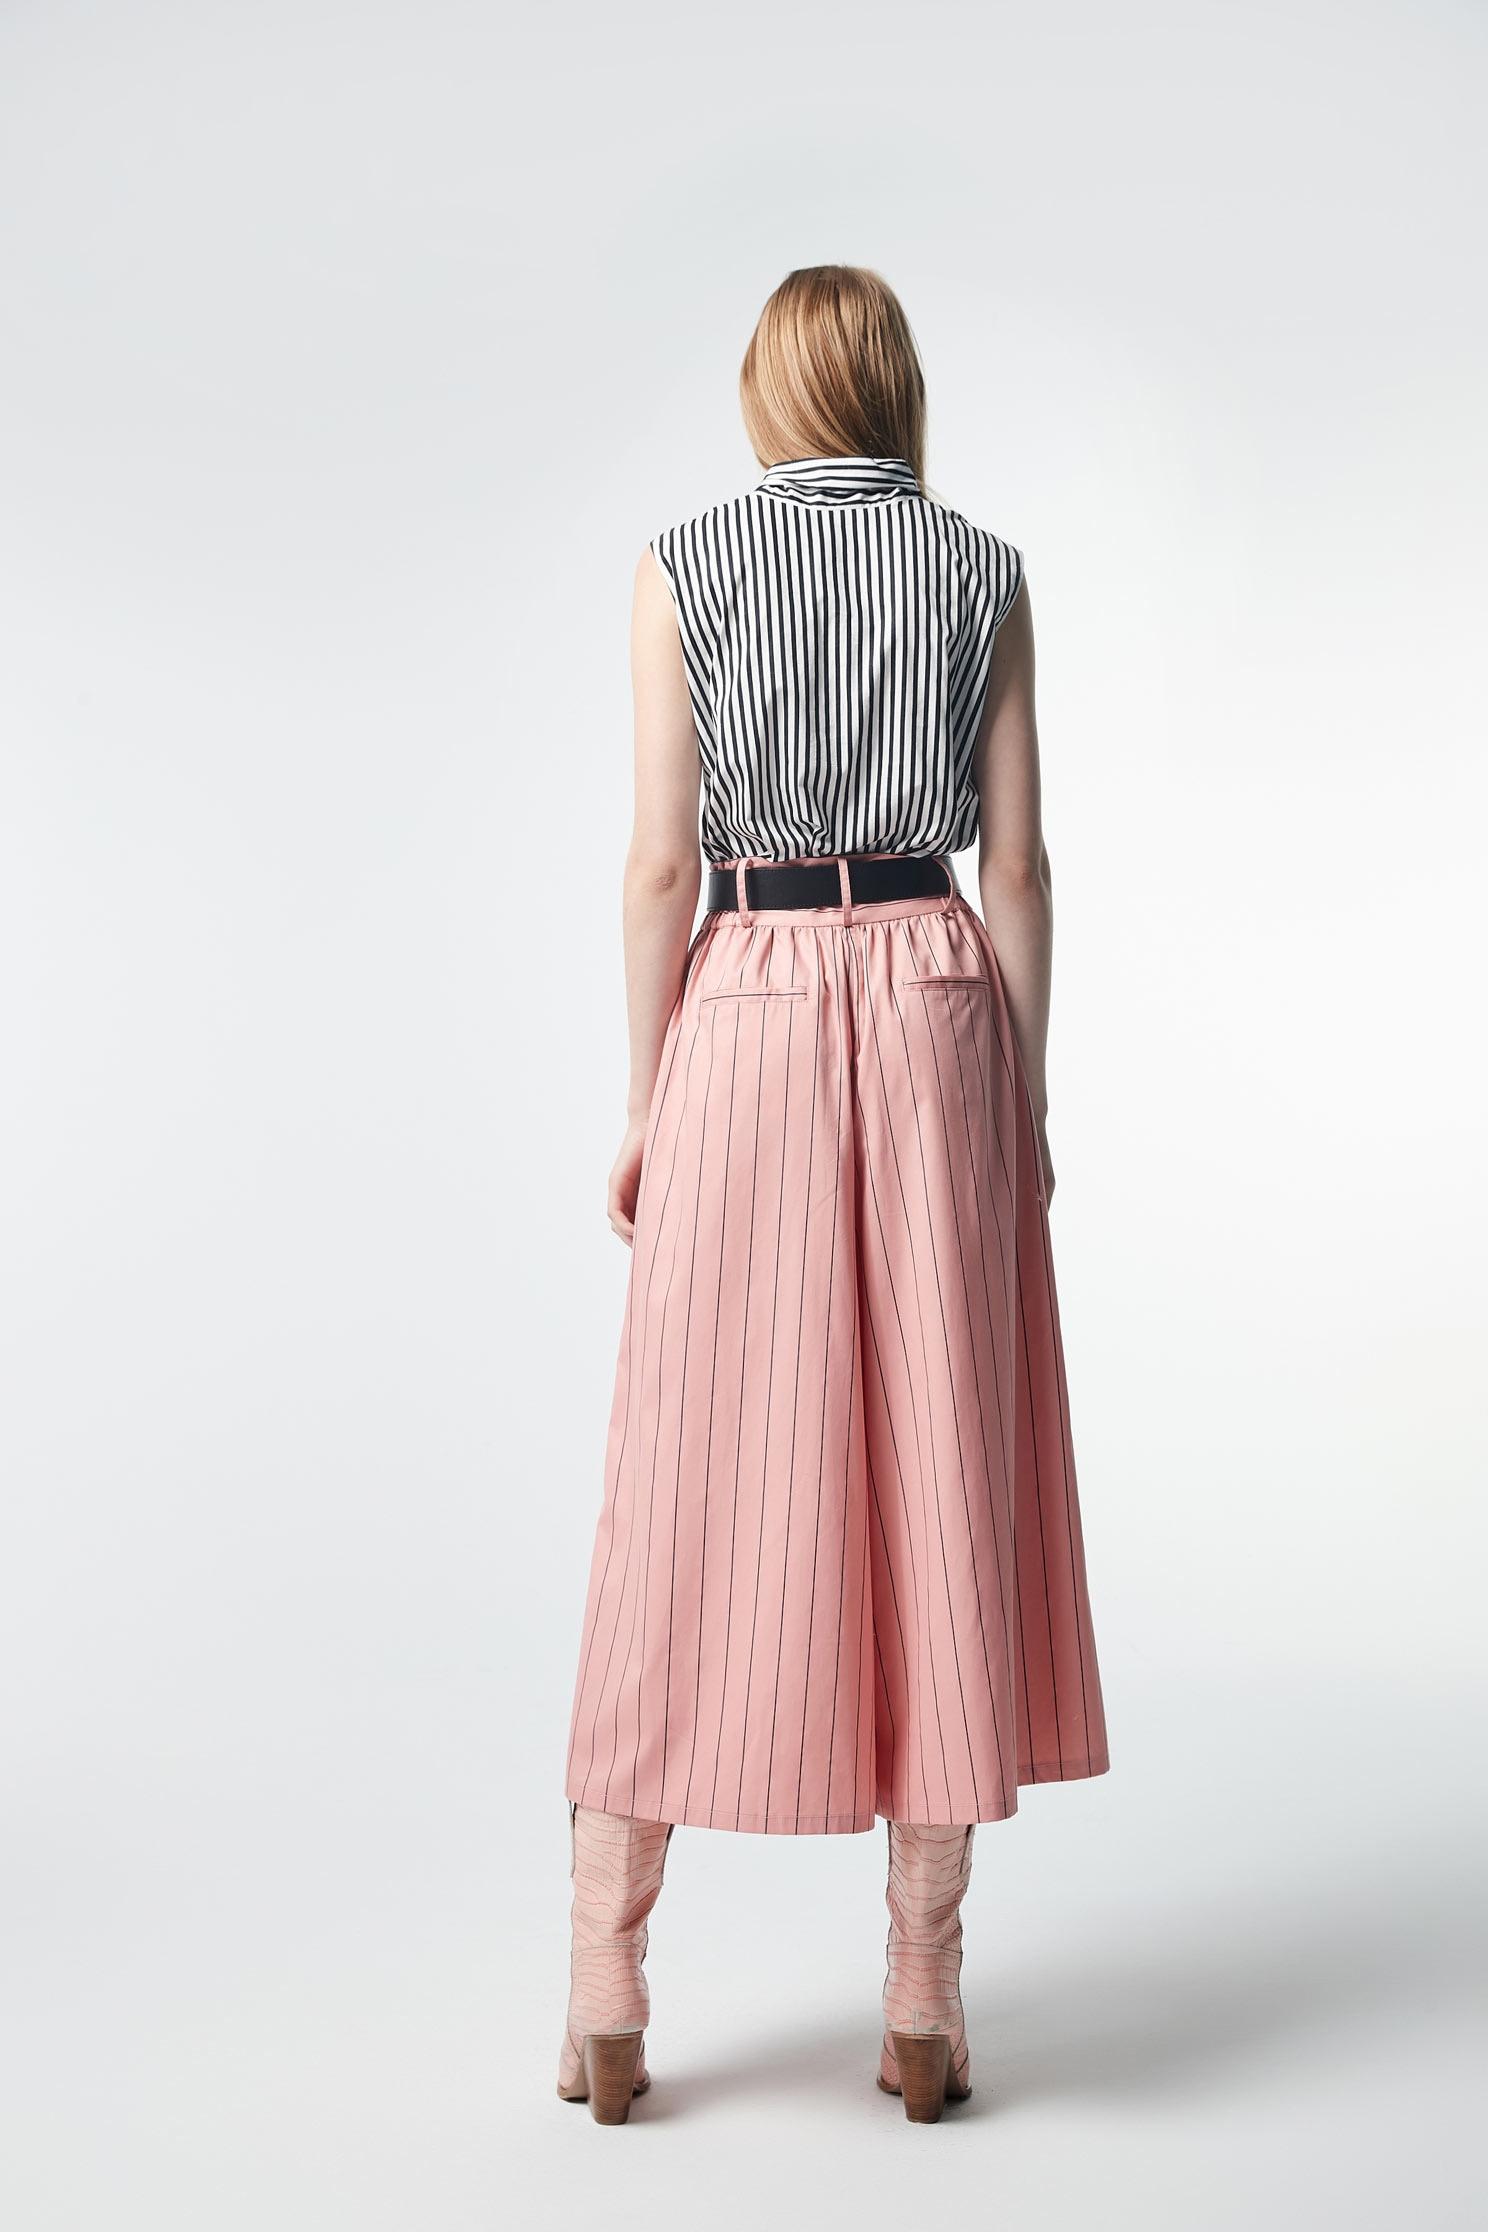 Striped vest,singlet,i-select,vest,girlfriendsspringtour